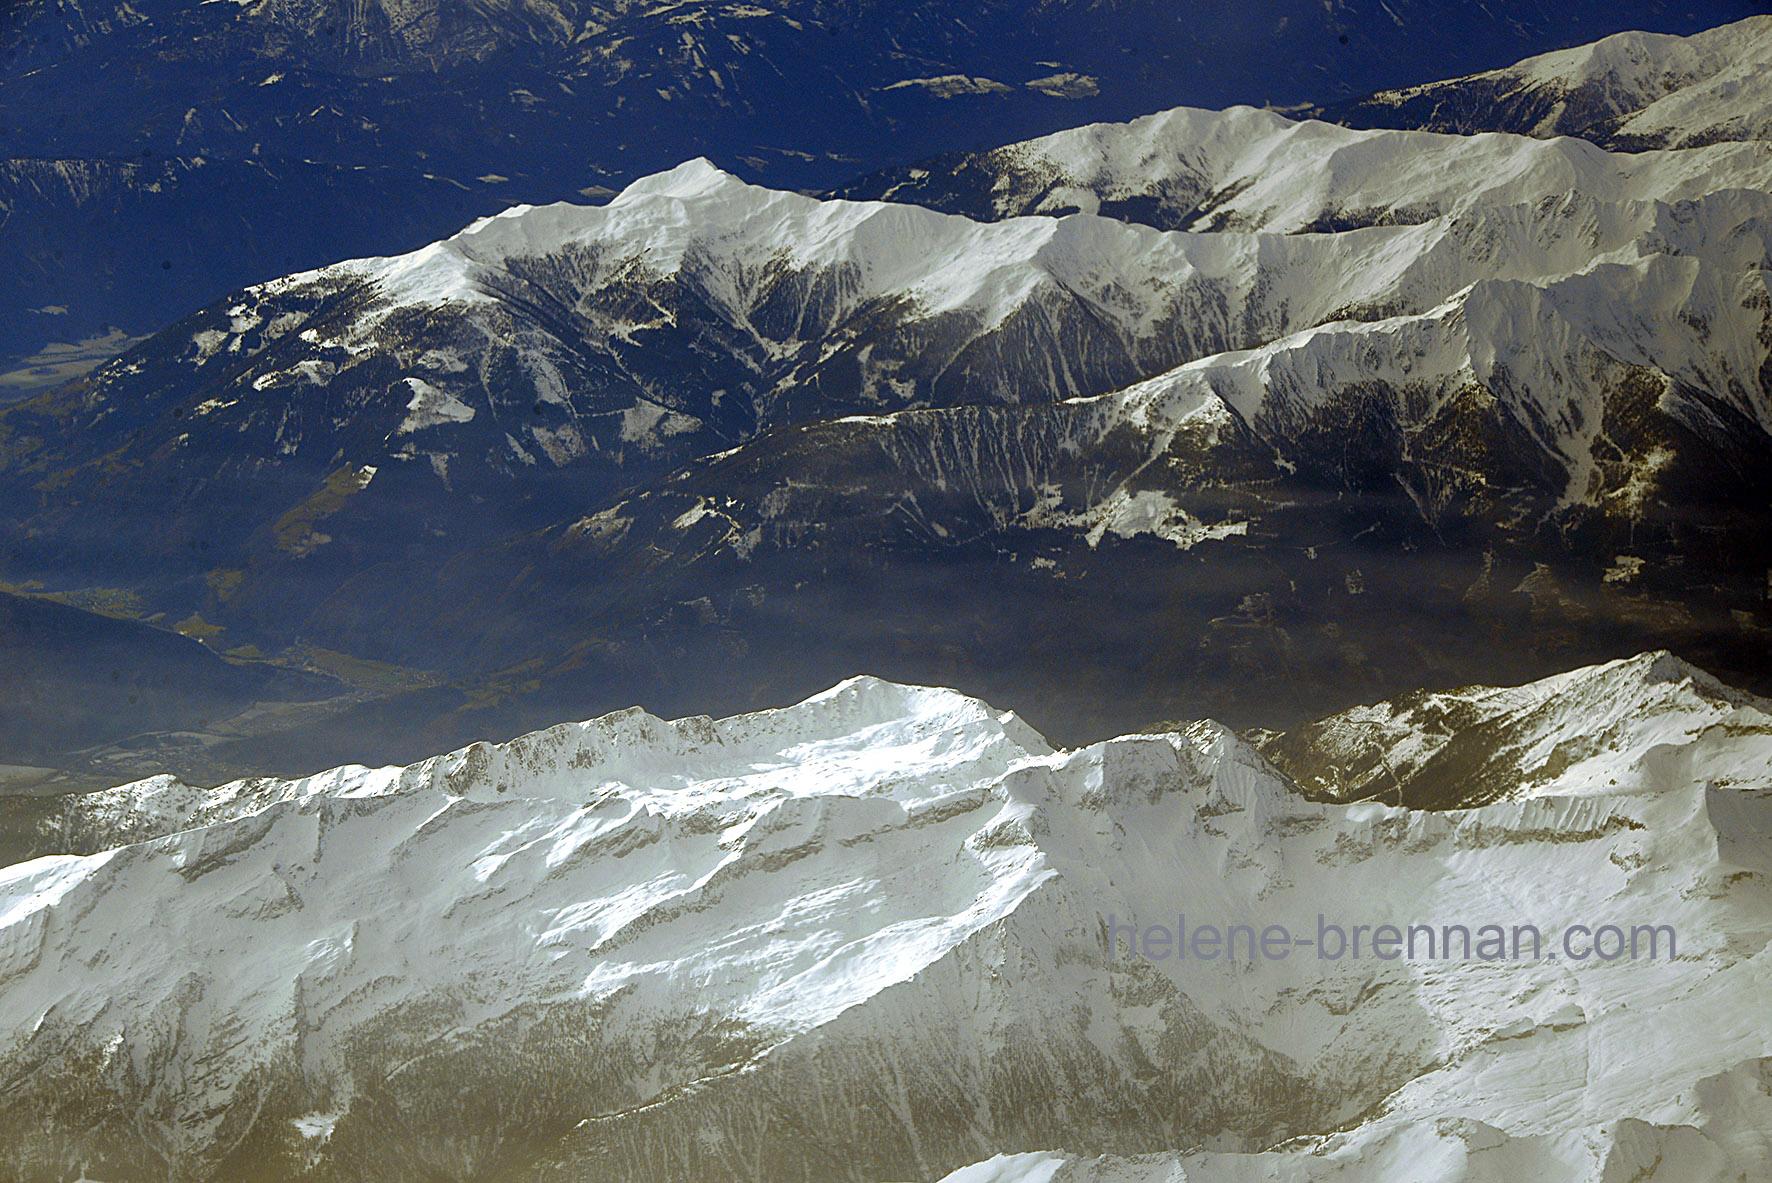 DSC_0408 alps with snow